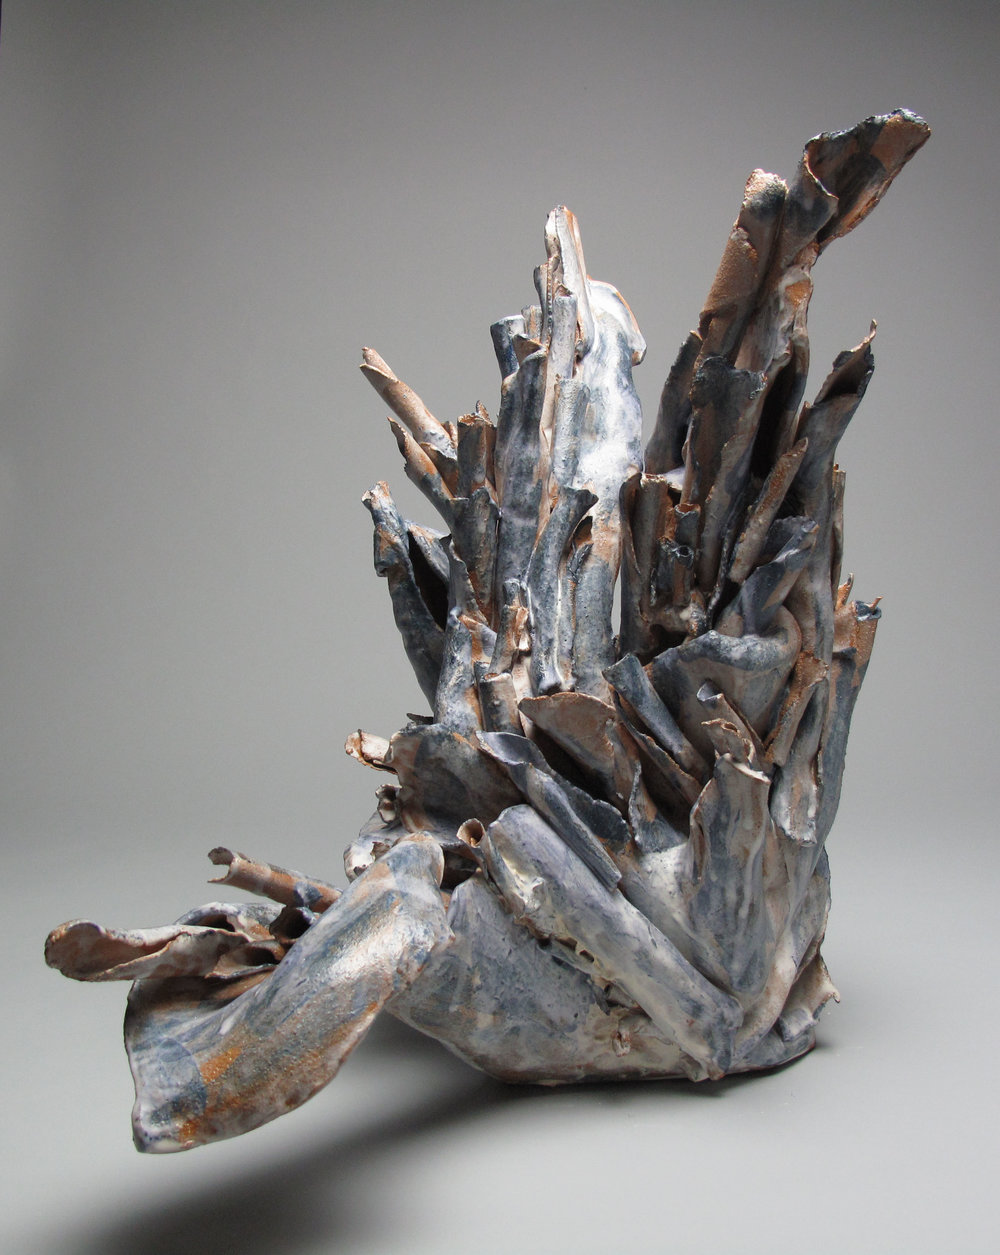 Sara Fine-Wilson,  Root , Stoneware, 18x16x8